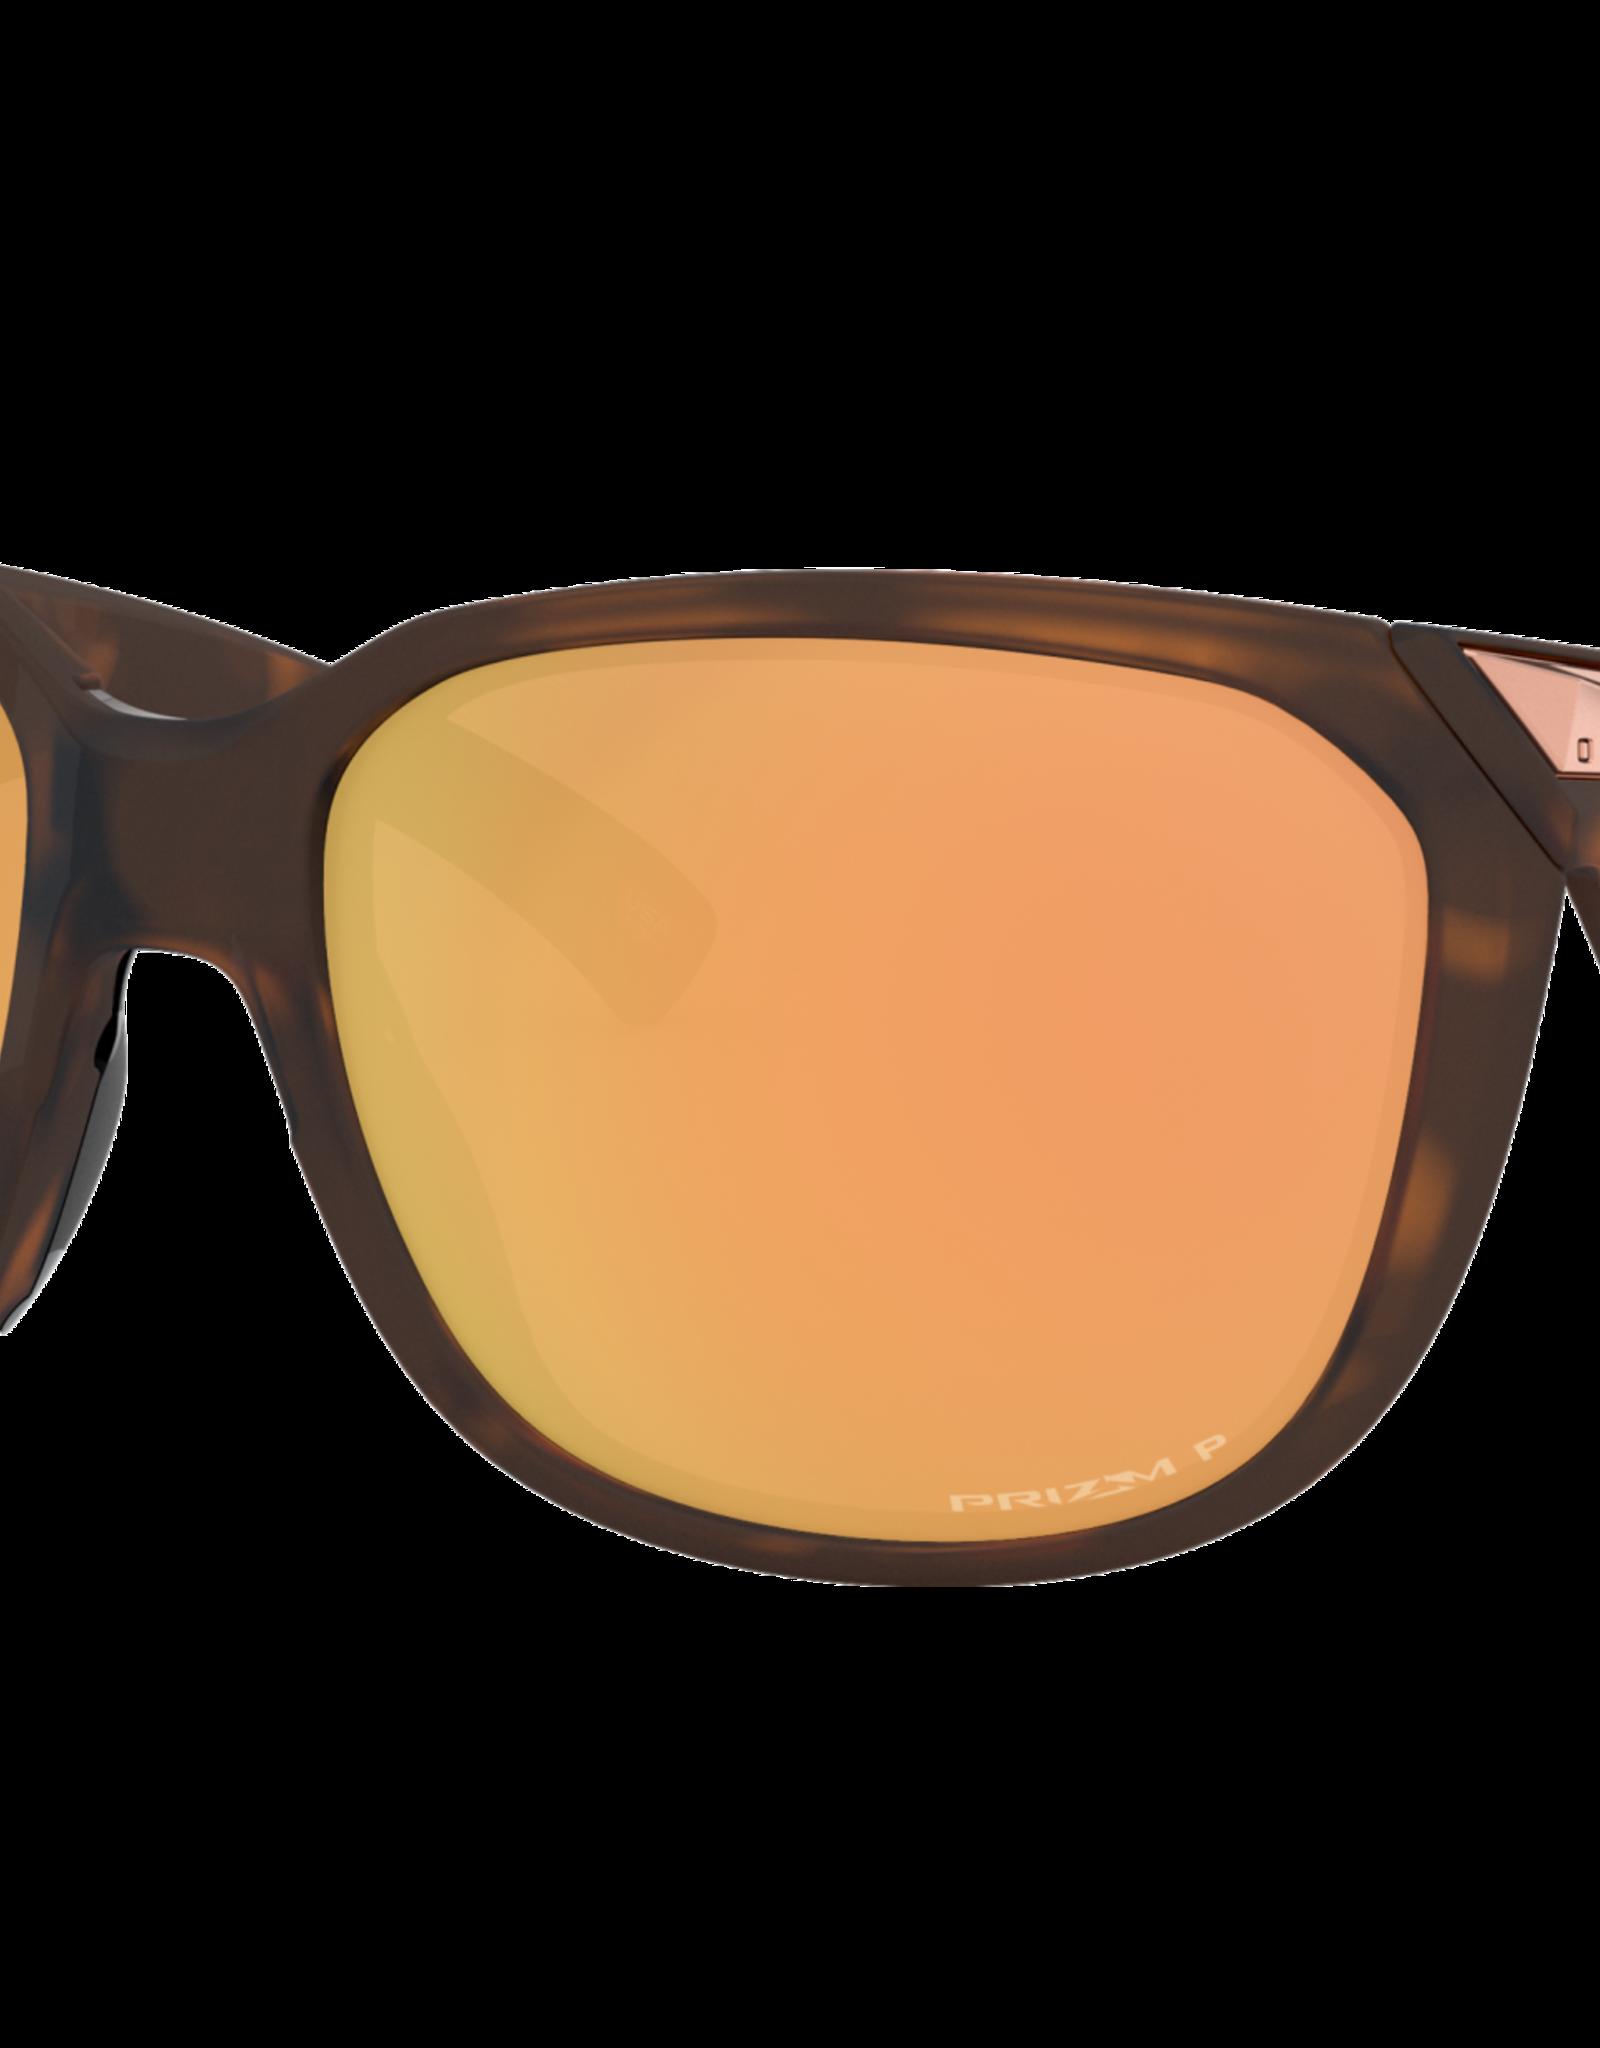 Oakley Oakley - REV UP - Matte Tort w/ PRIZM POLAR Rose Gold